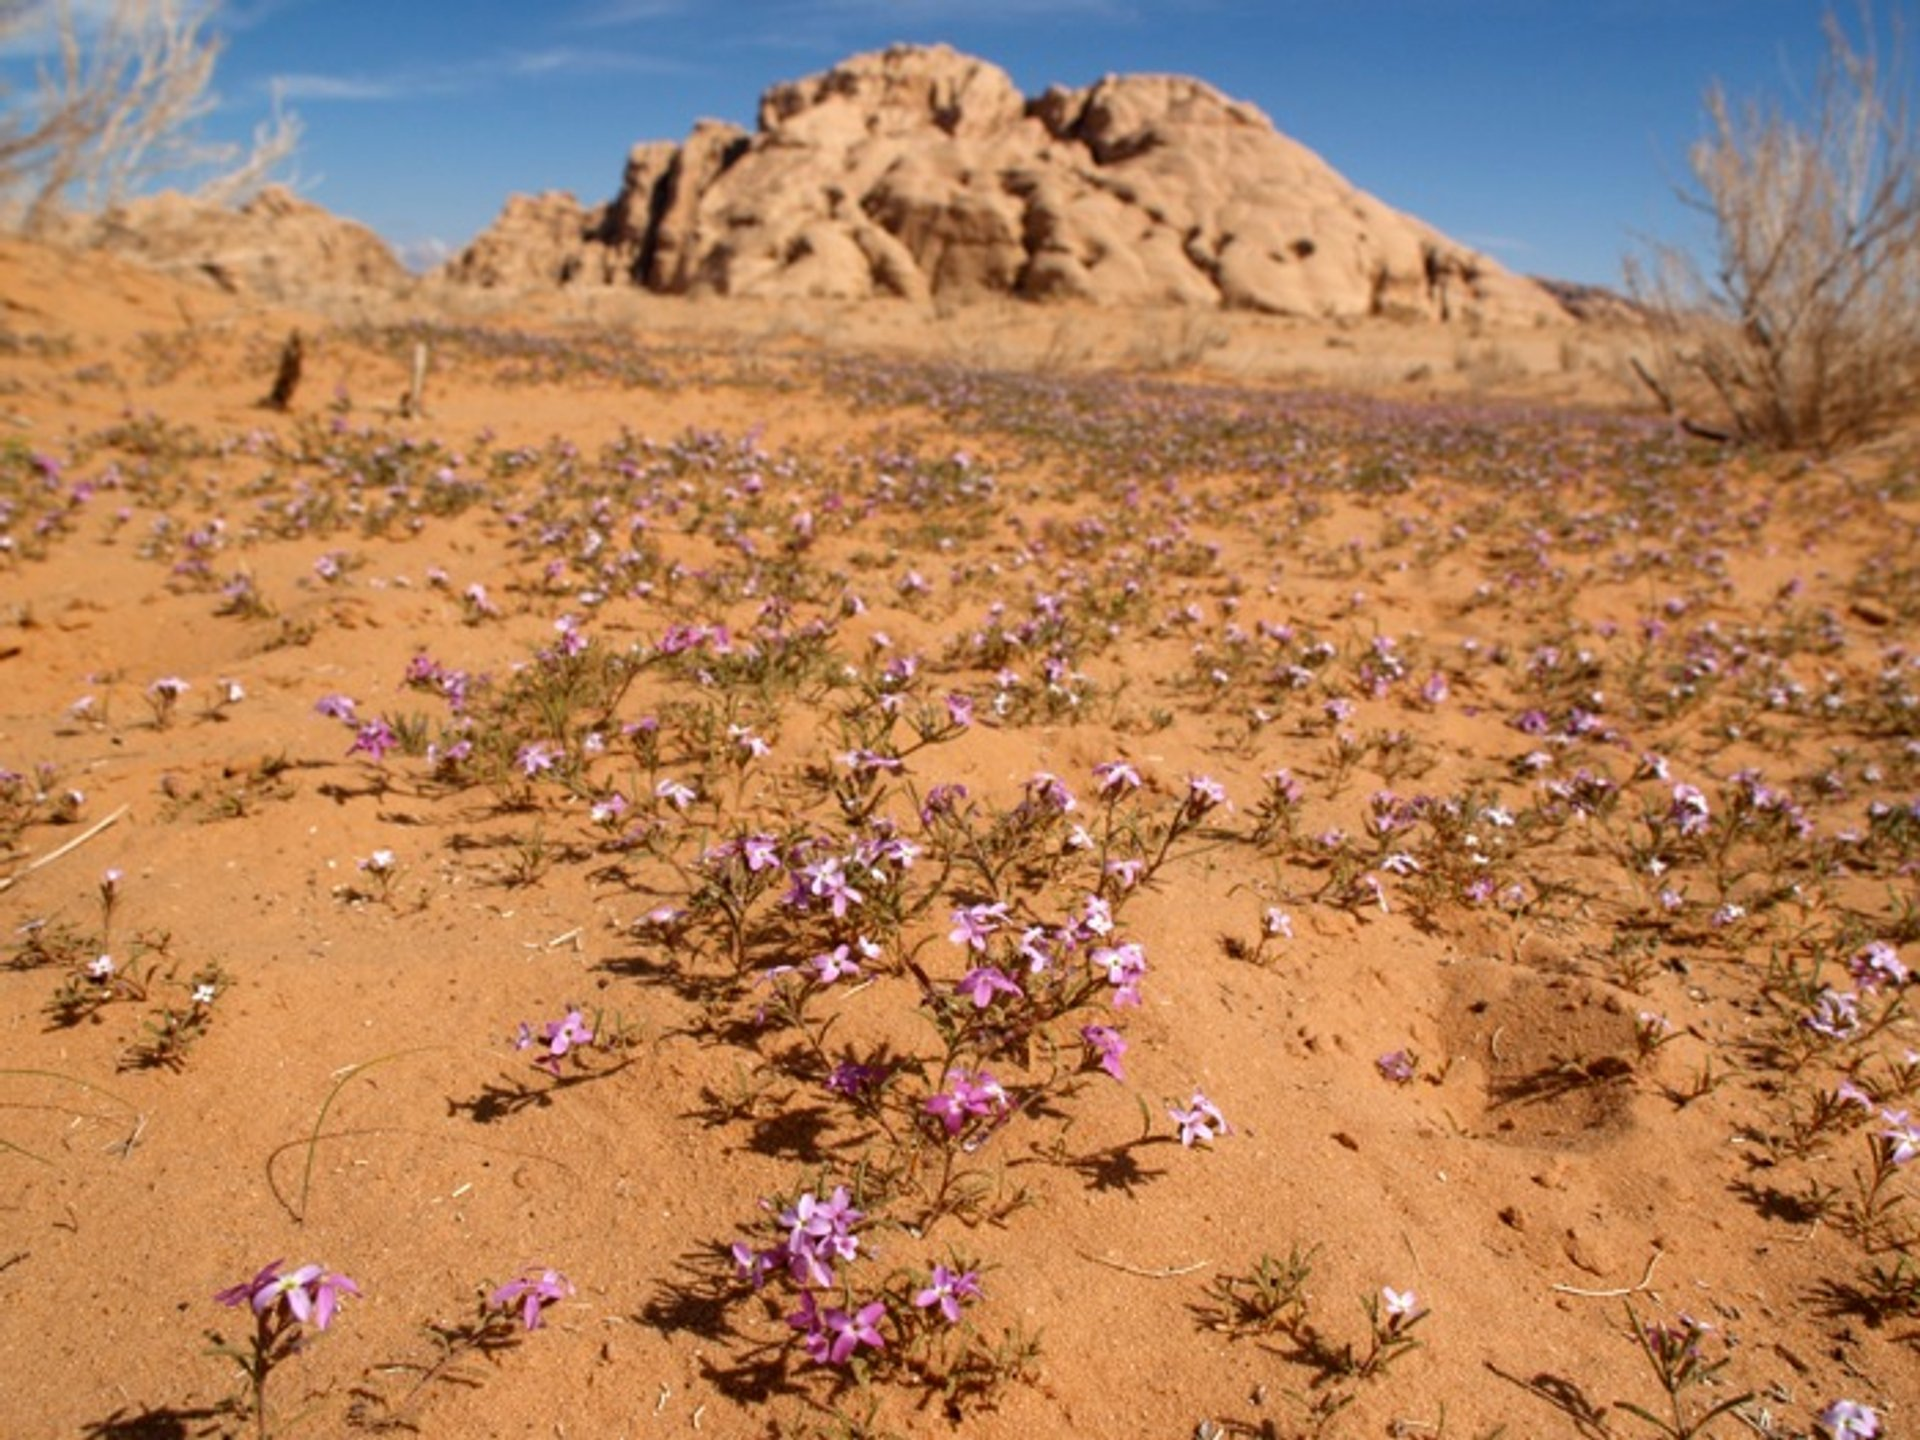 Wadi Rum Desert in Bloom in Jordan 2020 - Best Time